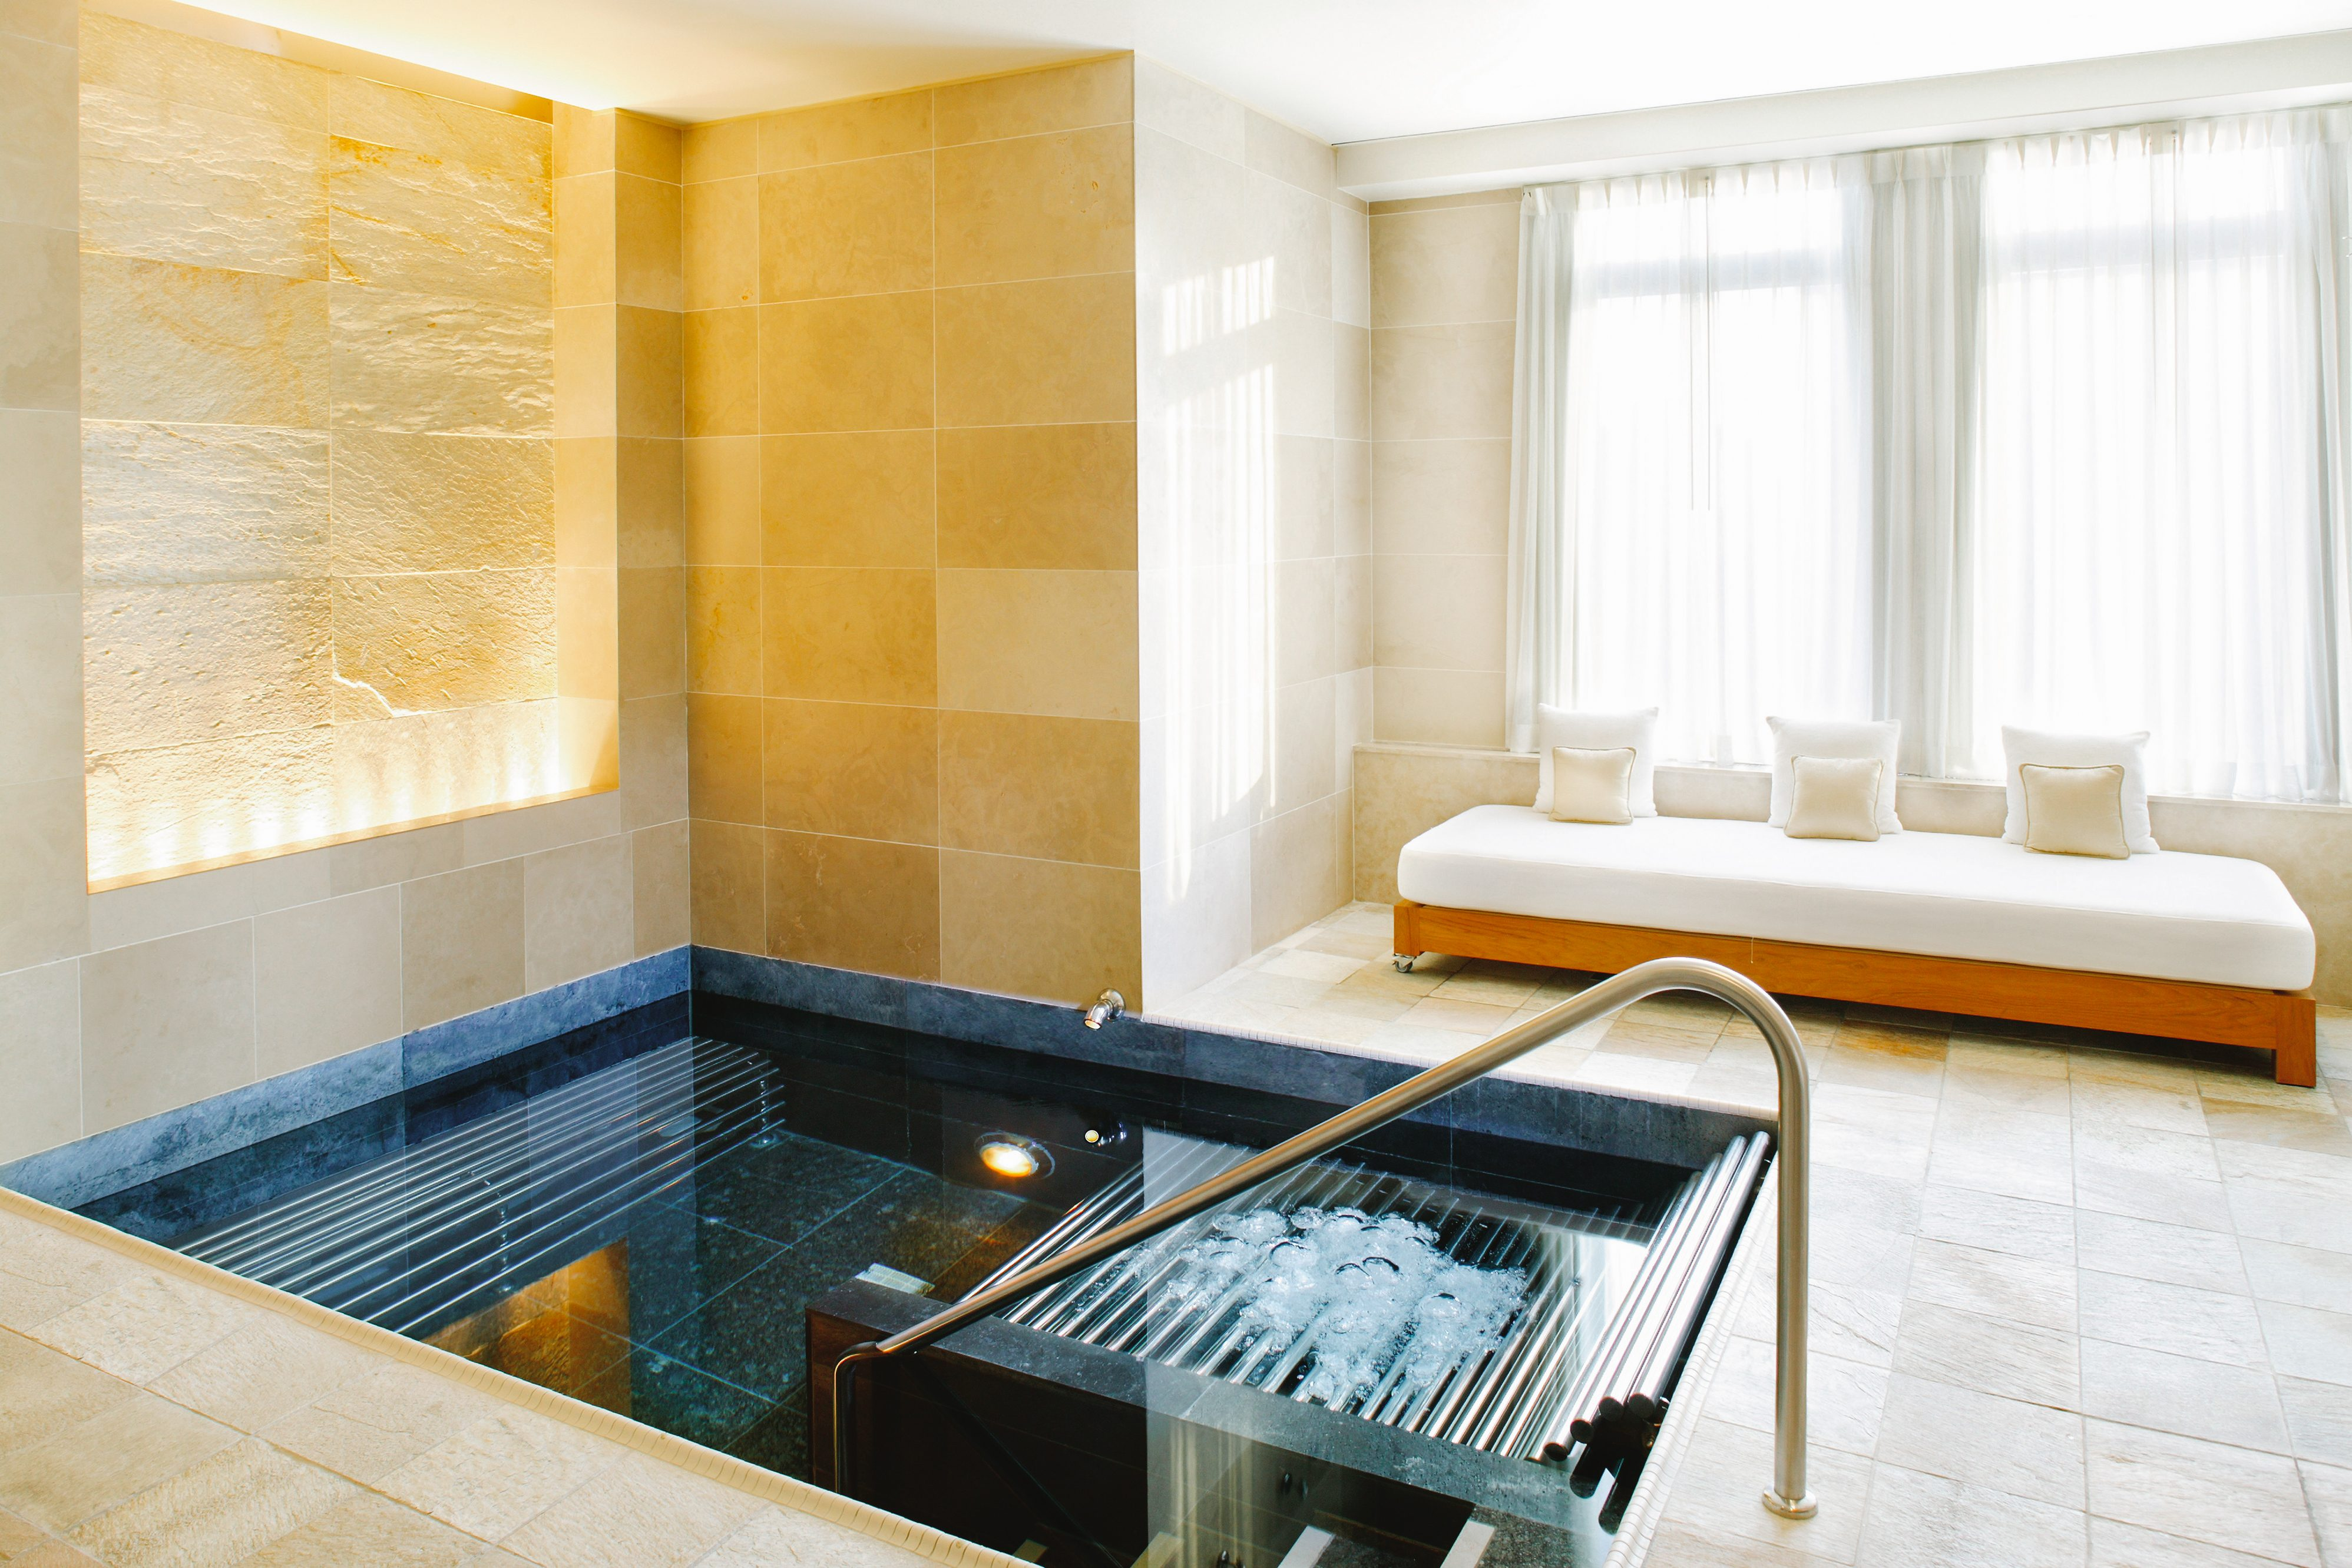 Vitality pool at the Spa at Mandarin Oriental, New York